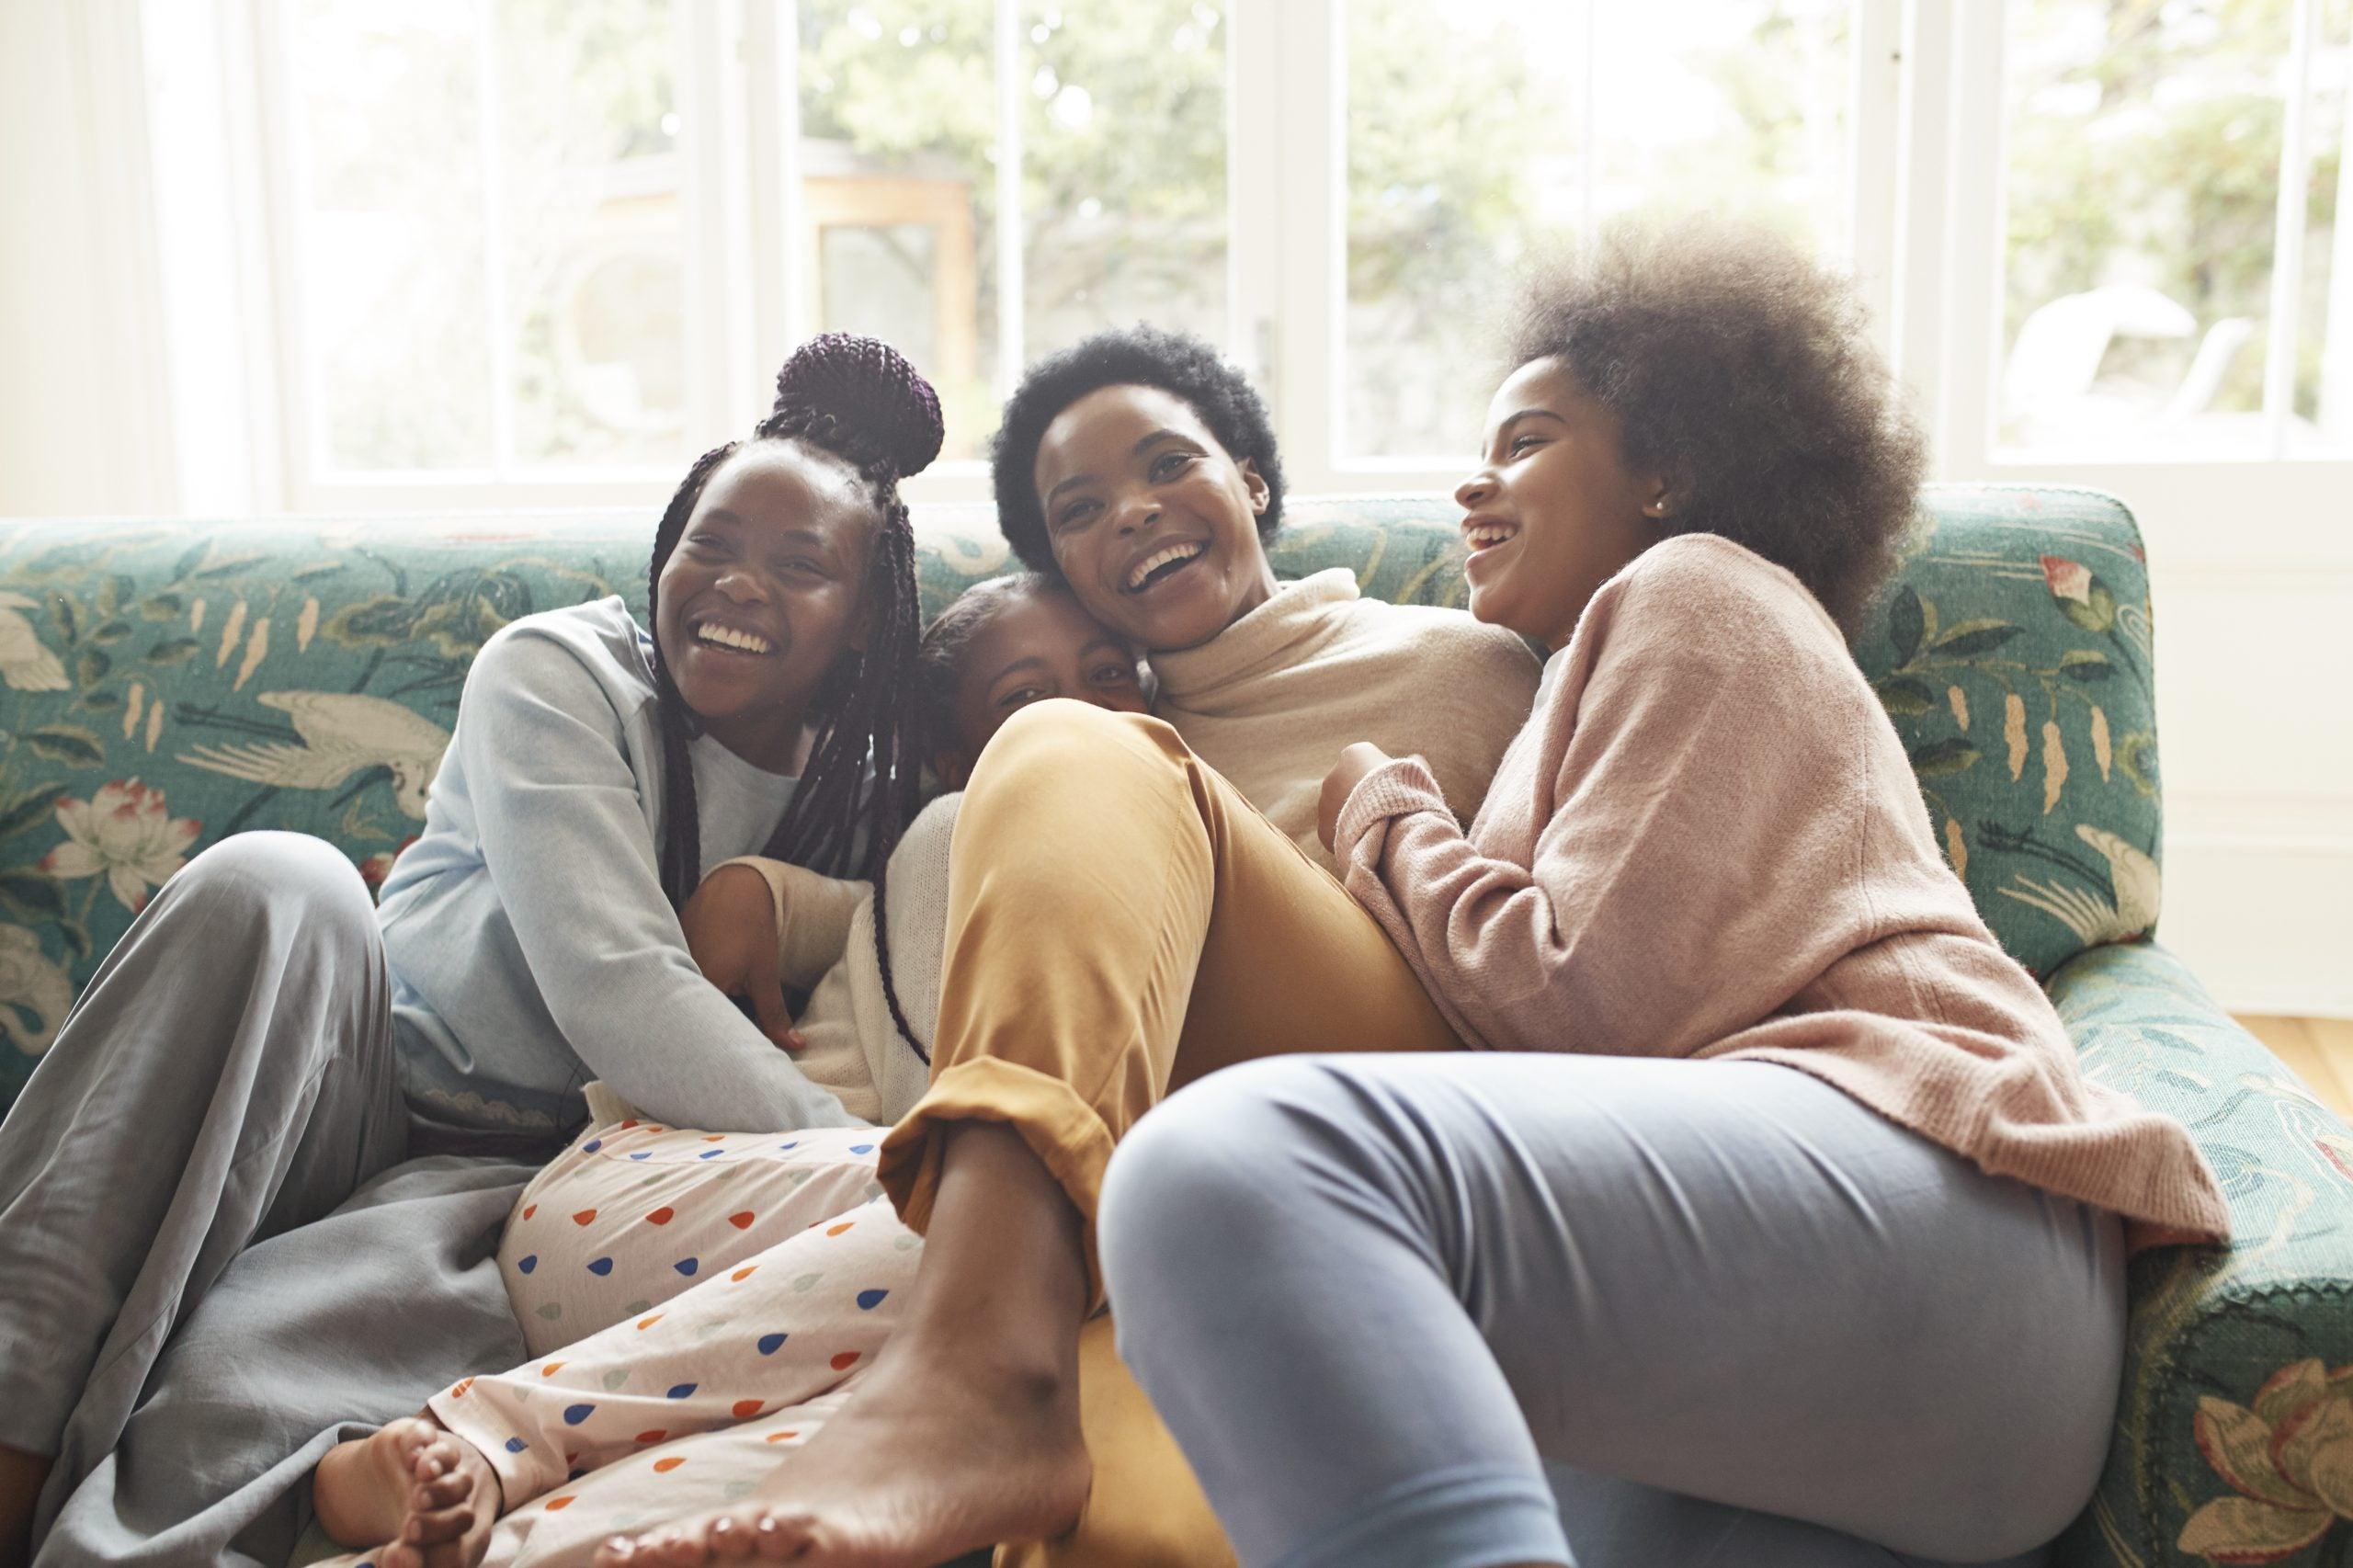 Reimagining An America That Uplifts Black Girls